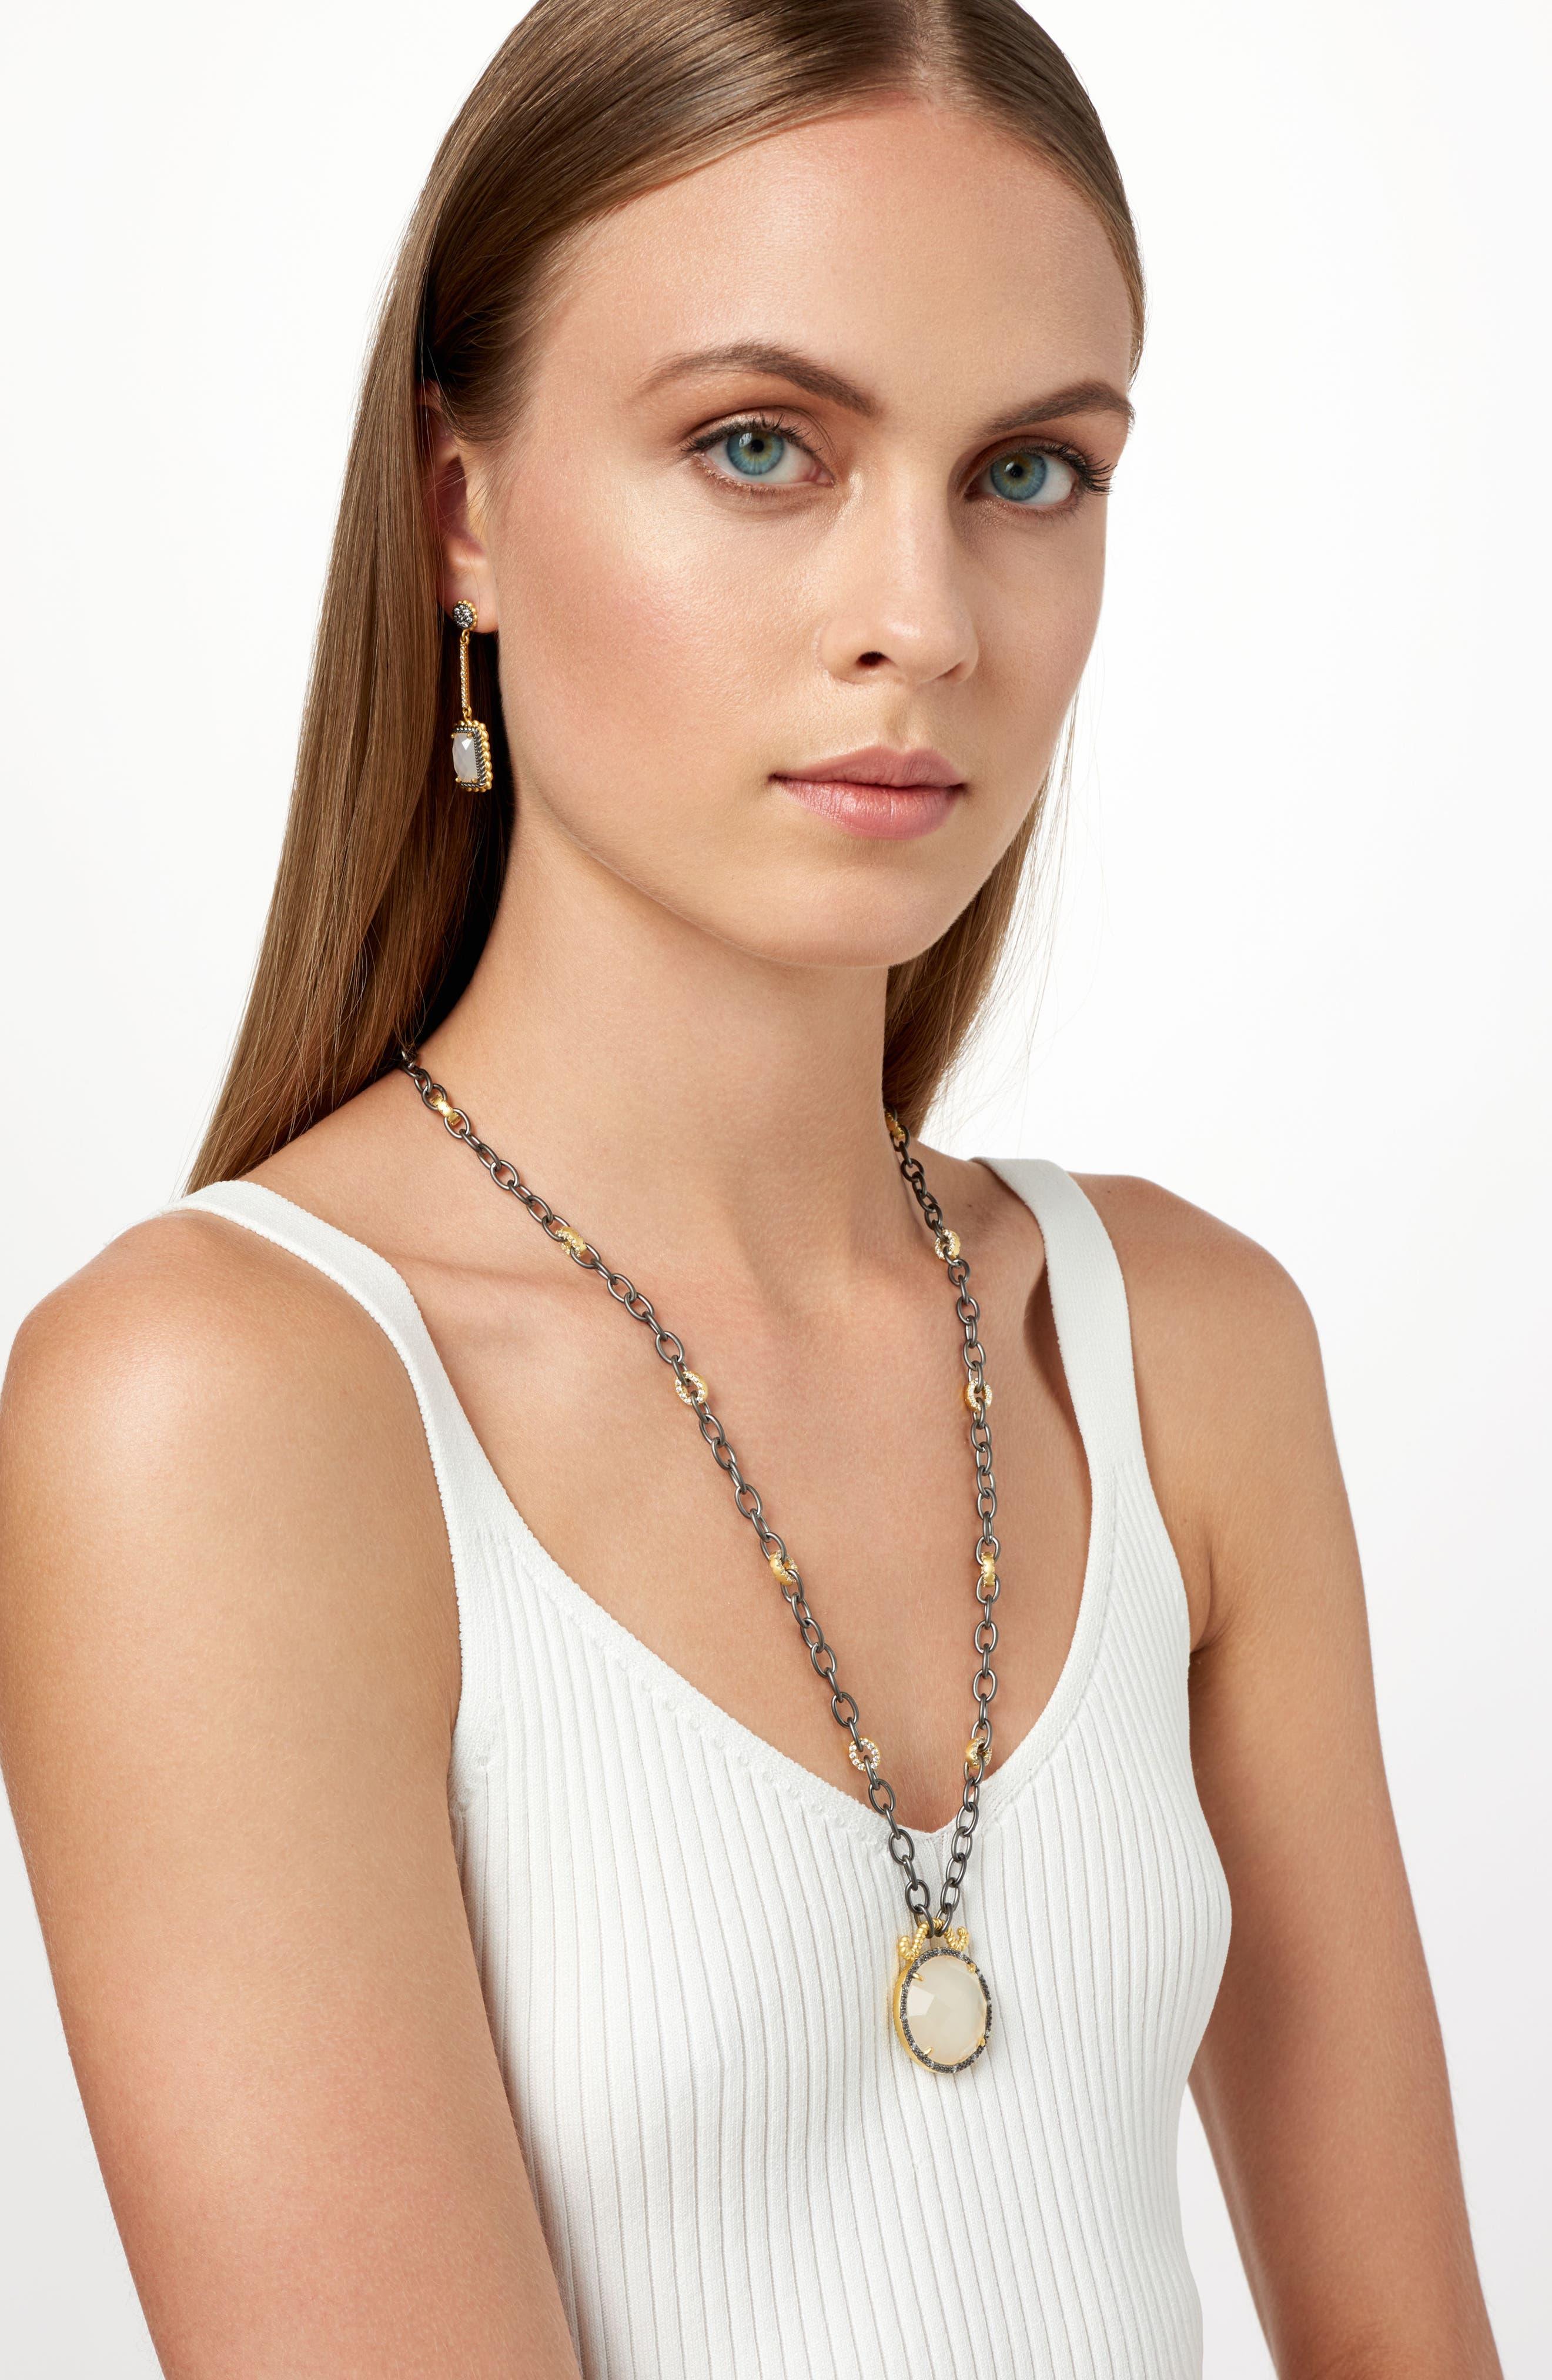 Gilded Cable Reversible Pendant Necklace,                             Alternate thumbnail 5, color,                             Black/ Gold